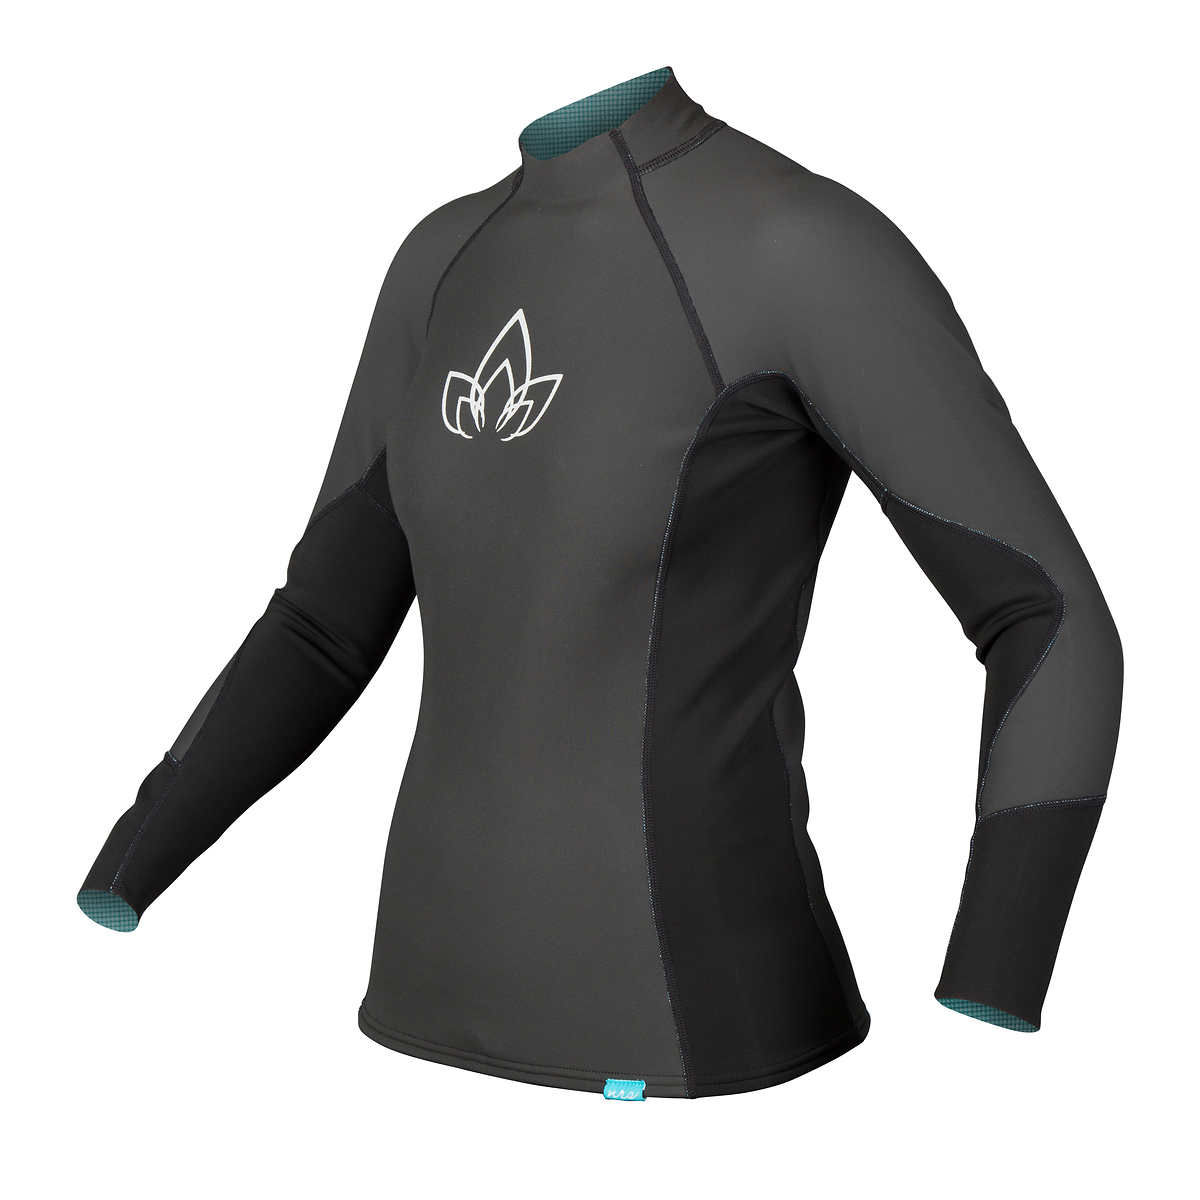 photo: NRS Women's HydroSkin 1.0 Shirt - L/S long sleeve paddling shirt